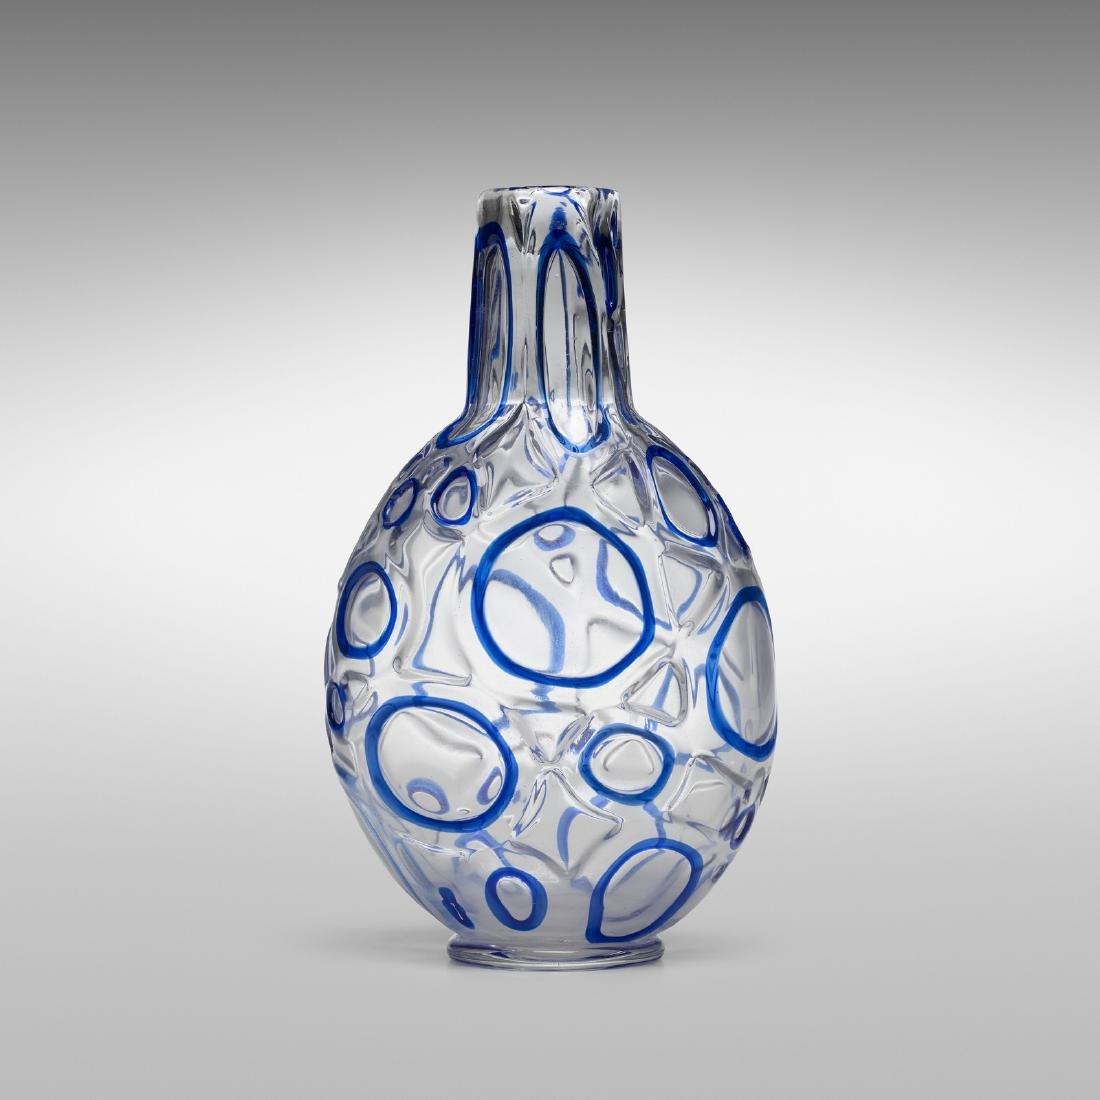 Ercole Barovier, Sidereo vase